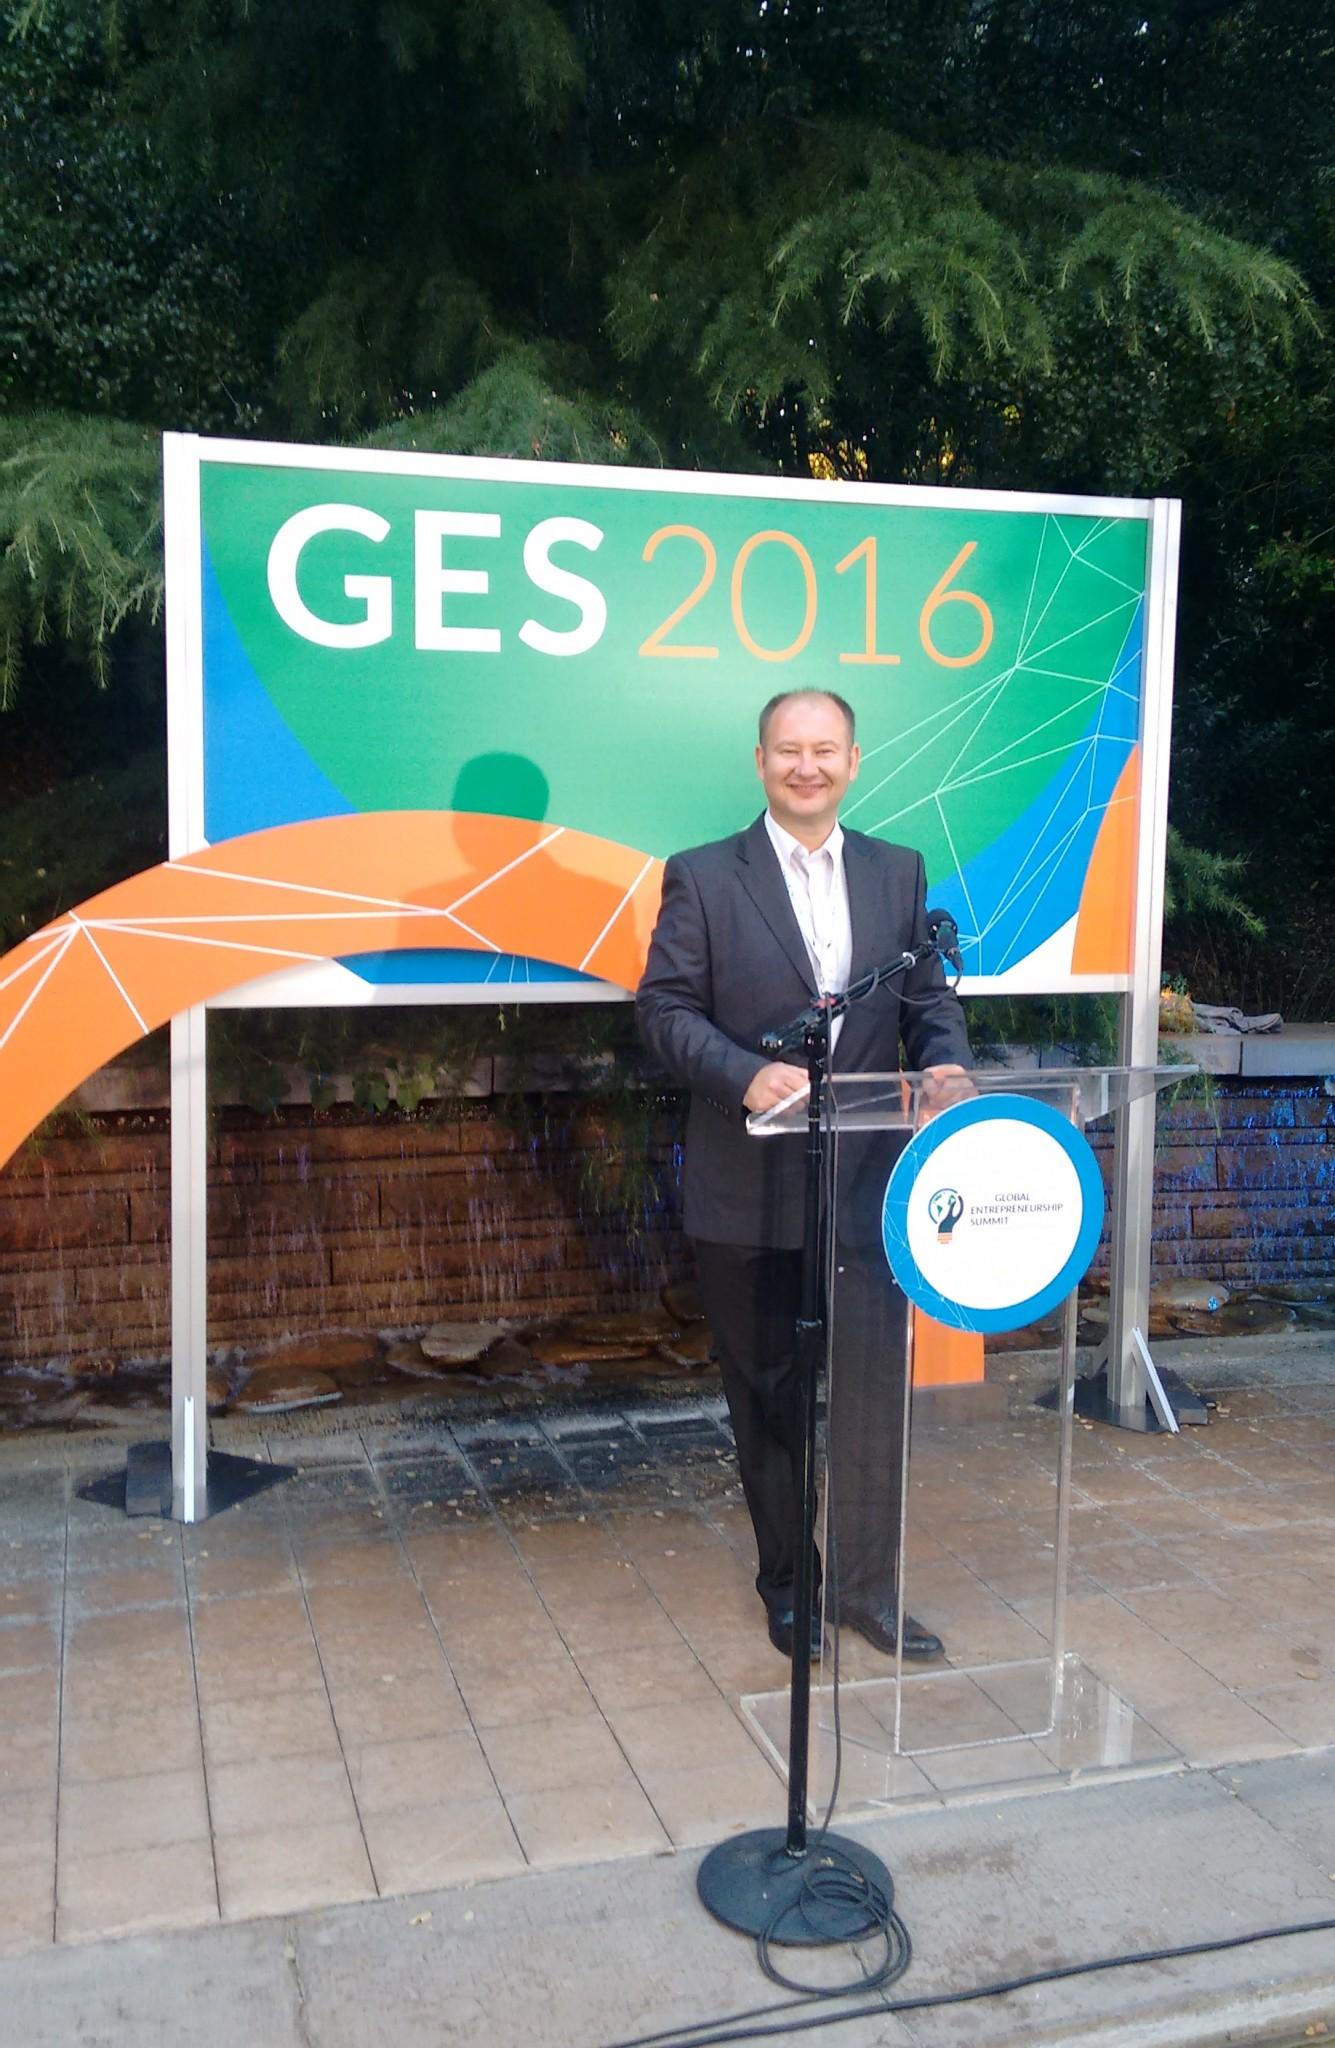 Cap to right: BwareIT's Konstantin Berezin at GES Summit 2016. Photo: courtesy